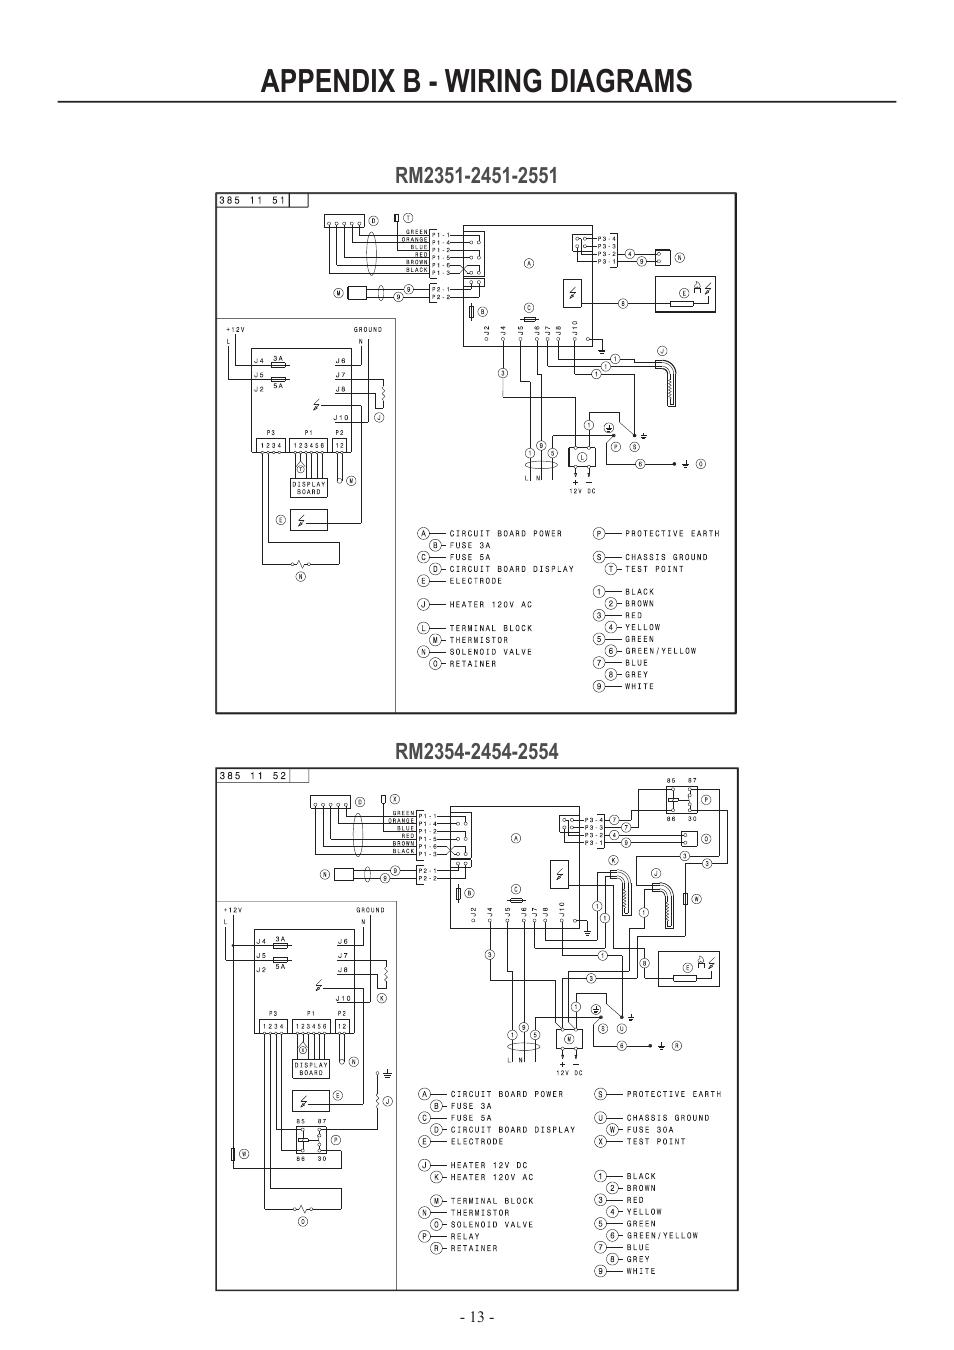 12 2 wiring diagrams